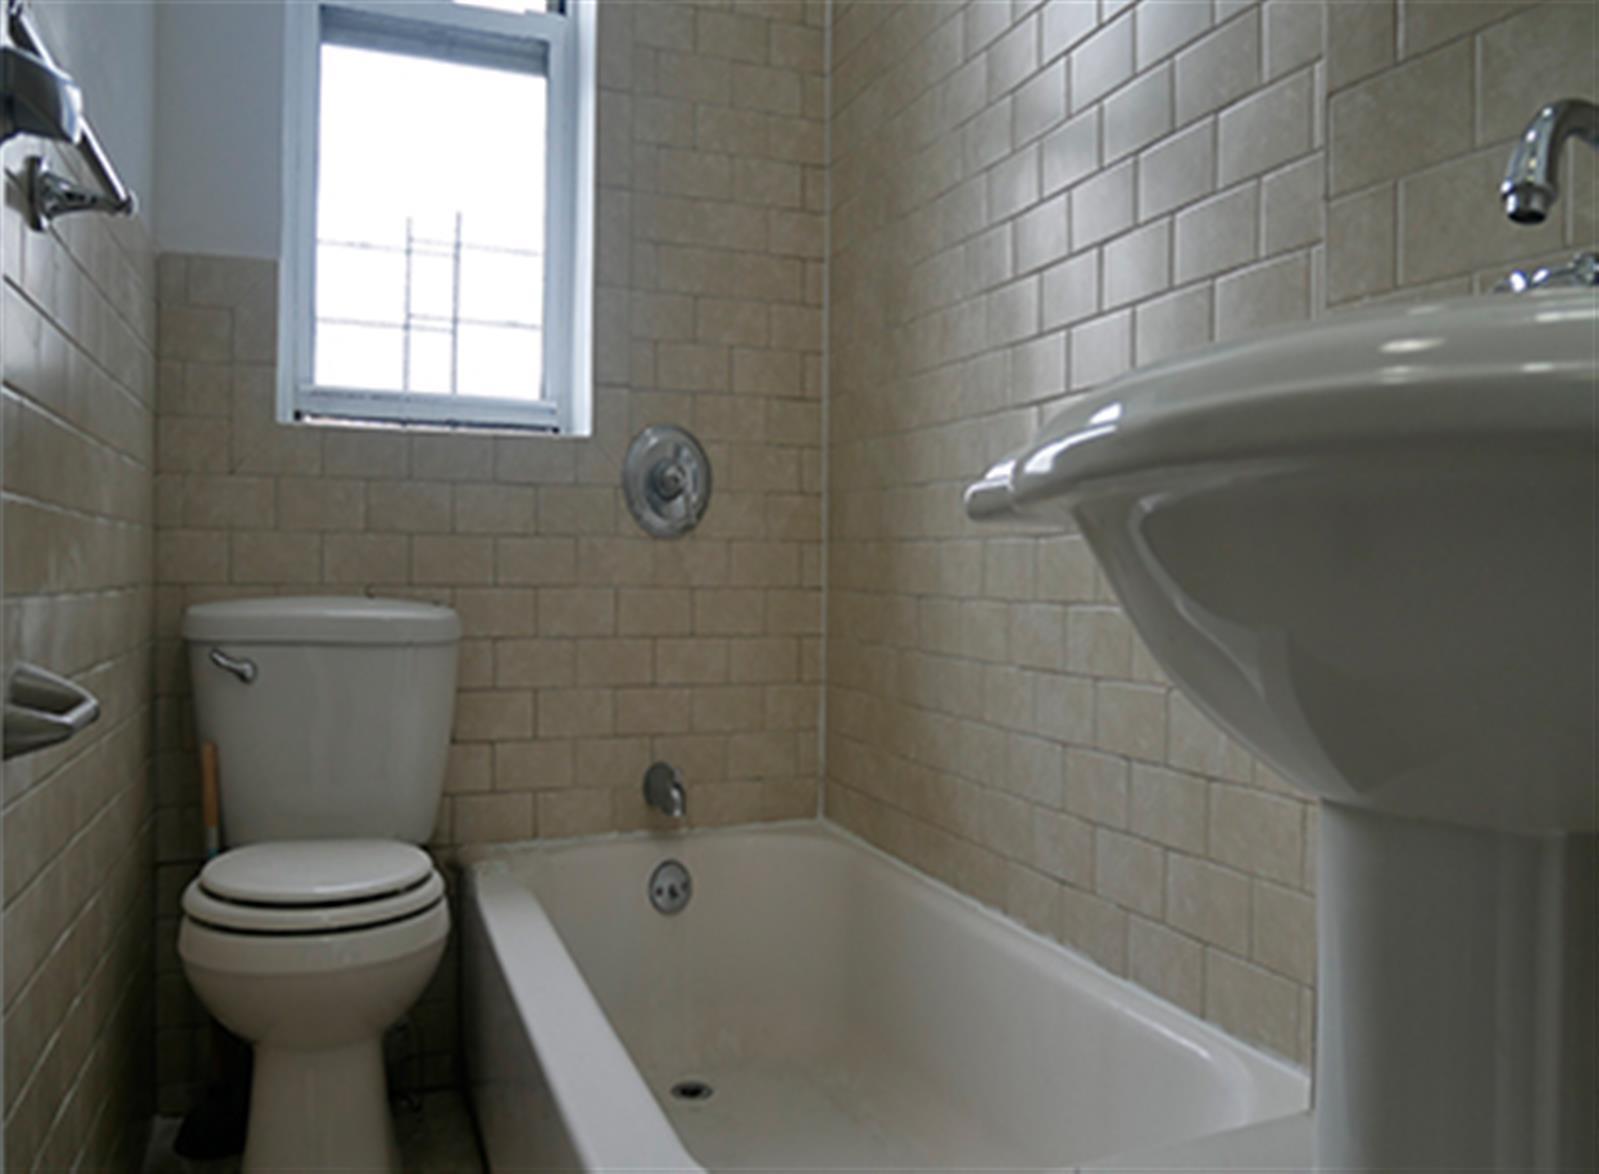 TWO BEDROOM - Washington Heights